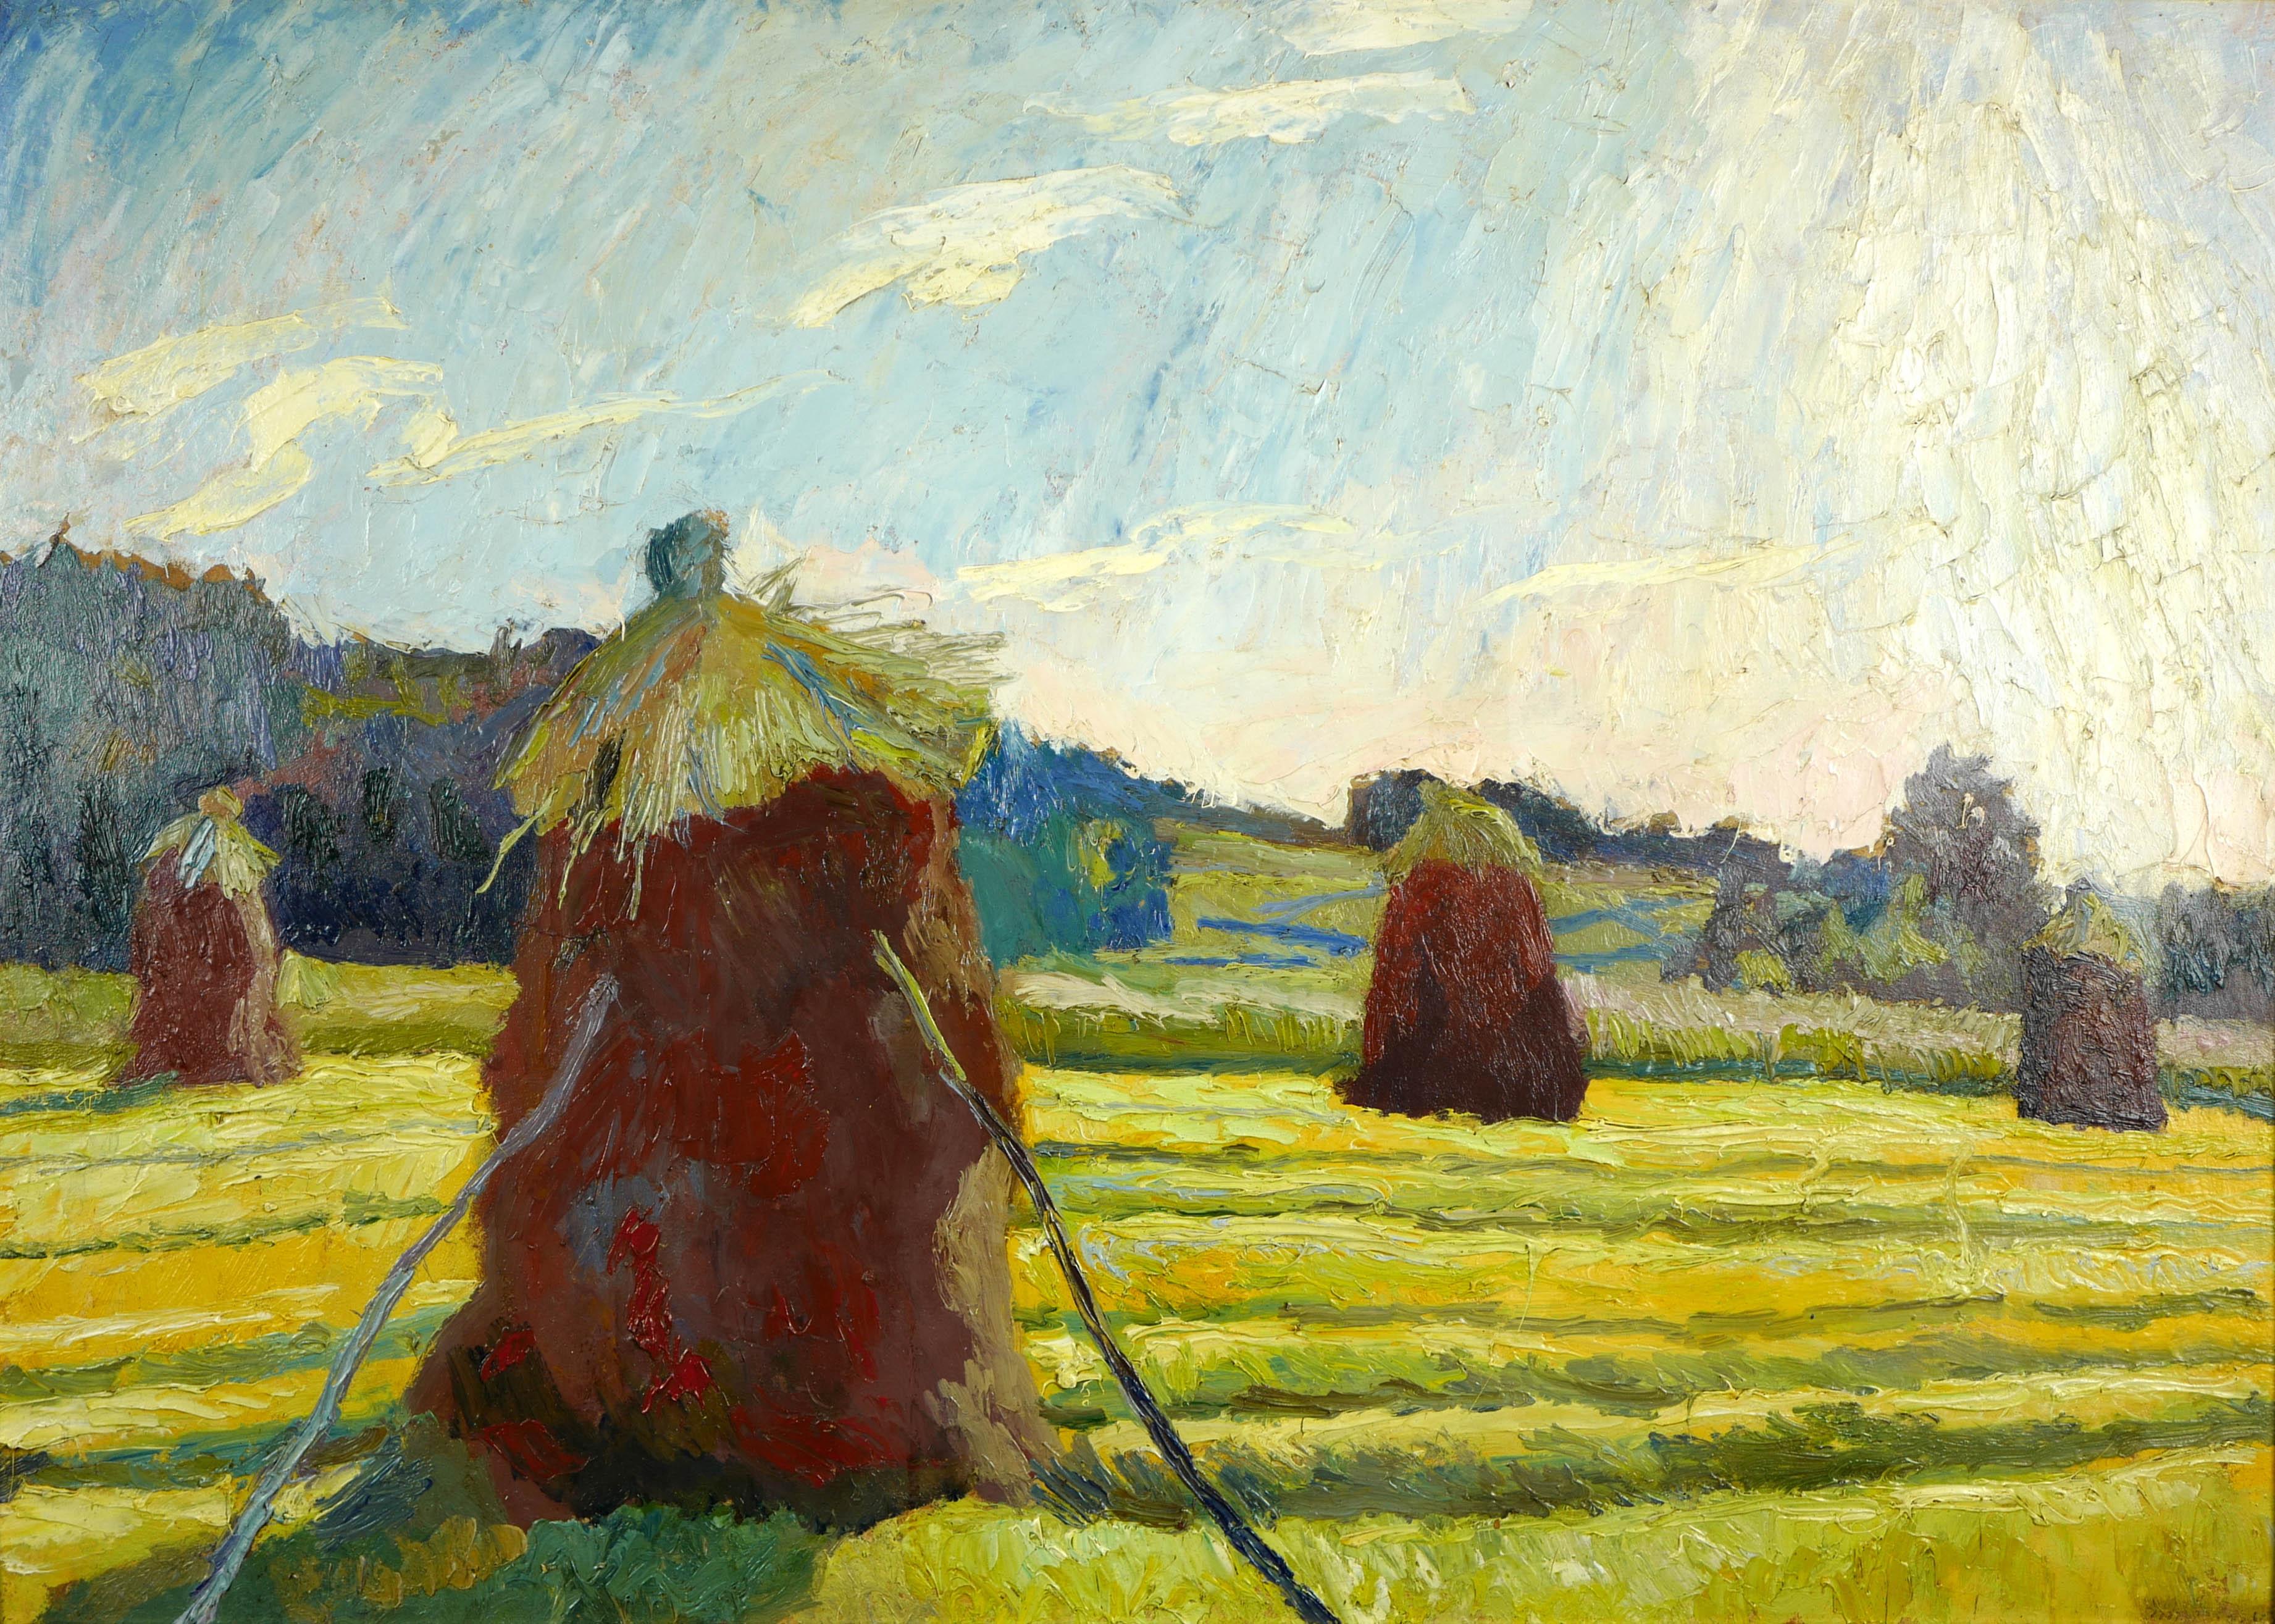 Snopy w polu